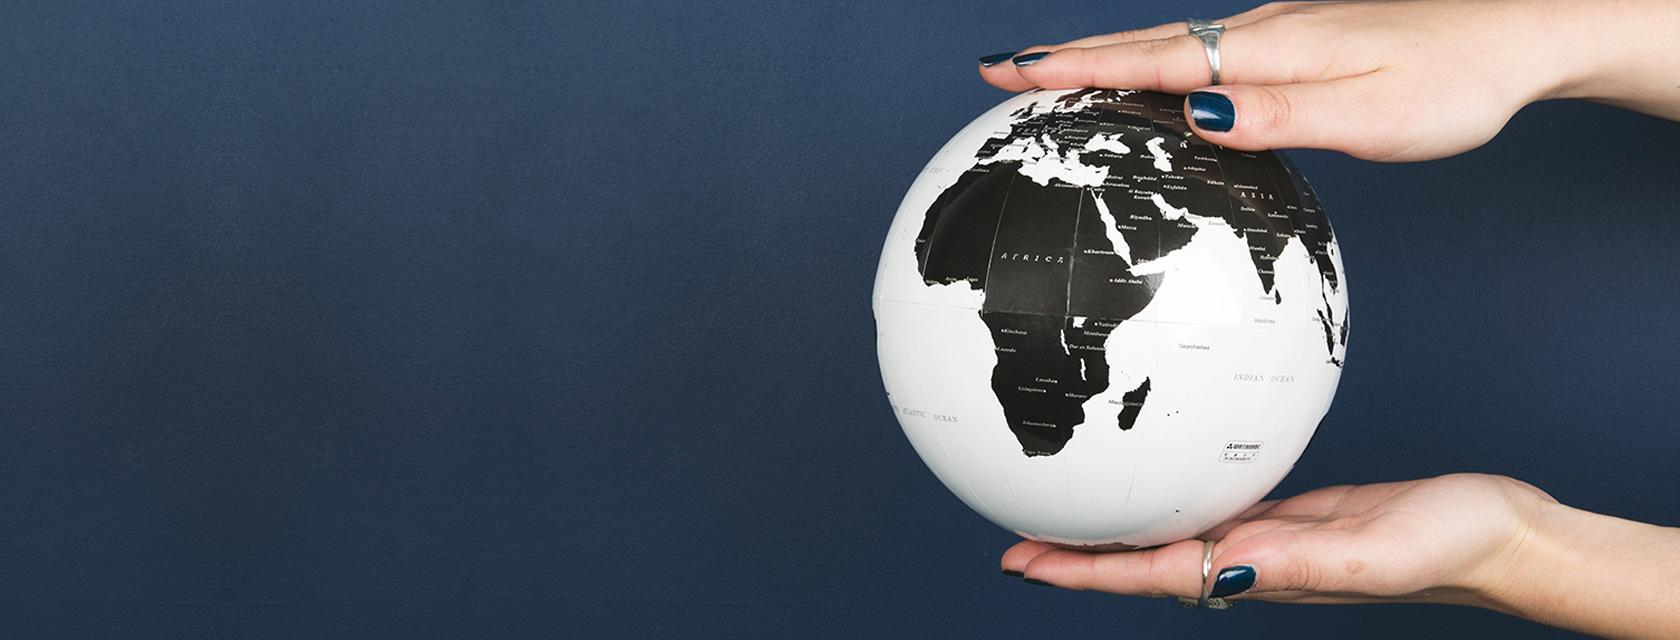 eCommerce businesses beyond U.S. borders